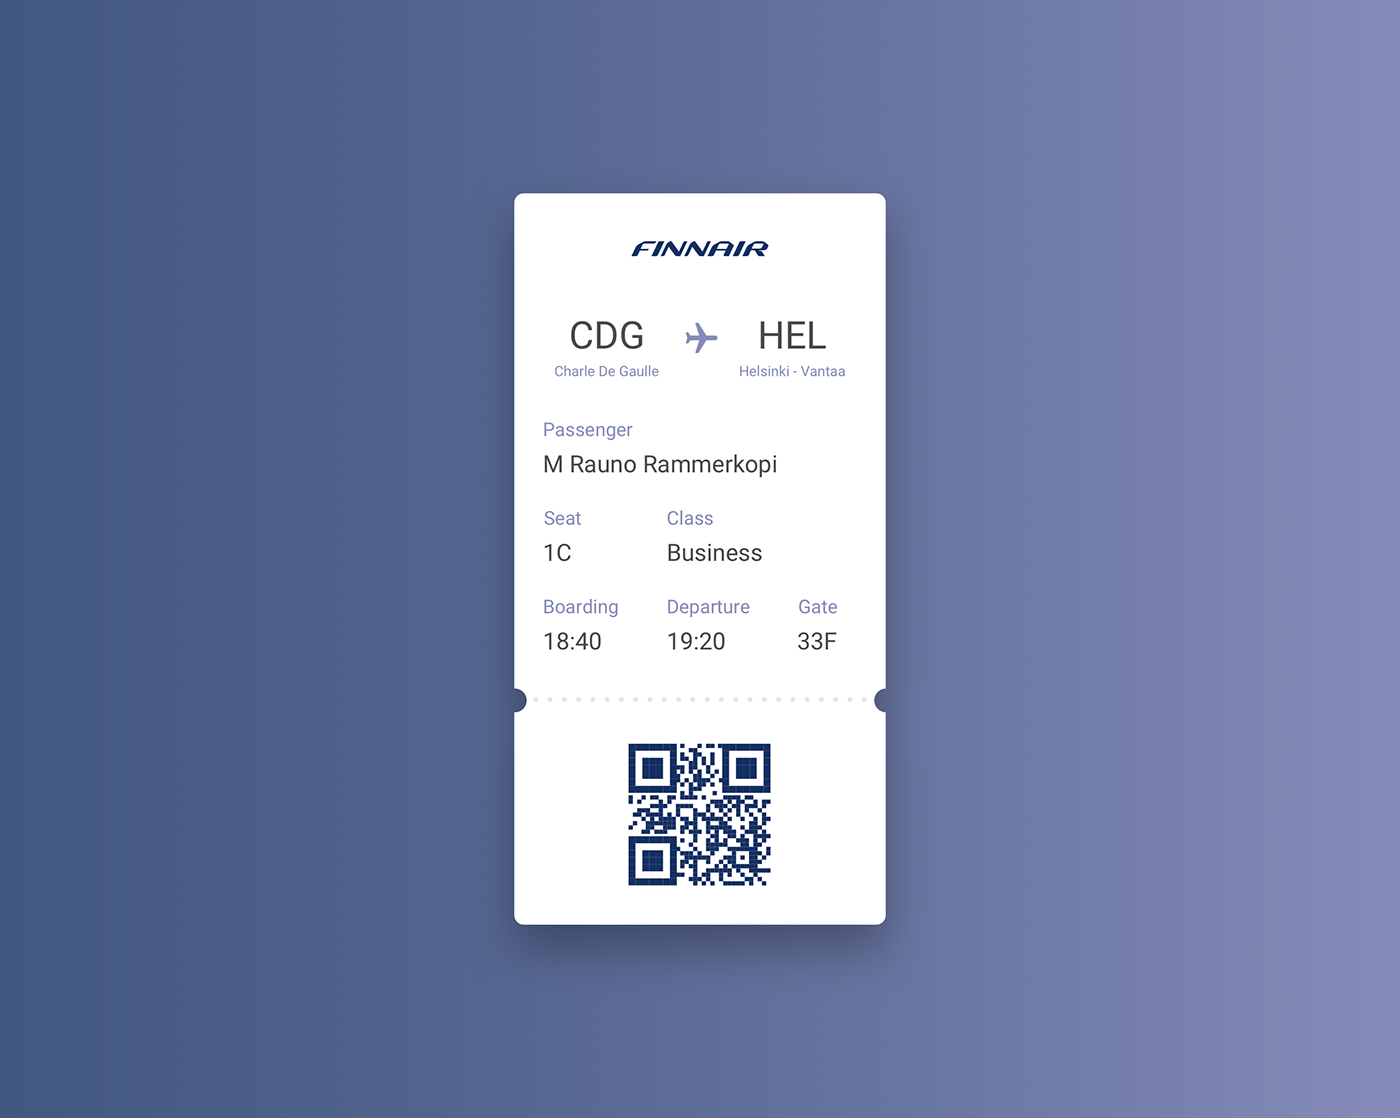 UI ux DailyUI design Interface boarding pass Web app mobile